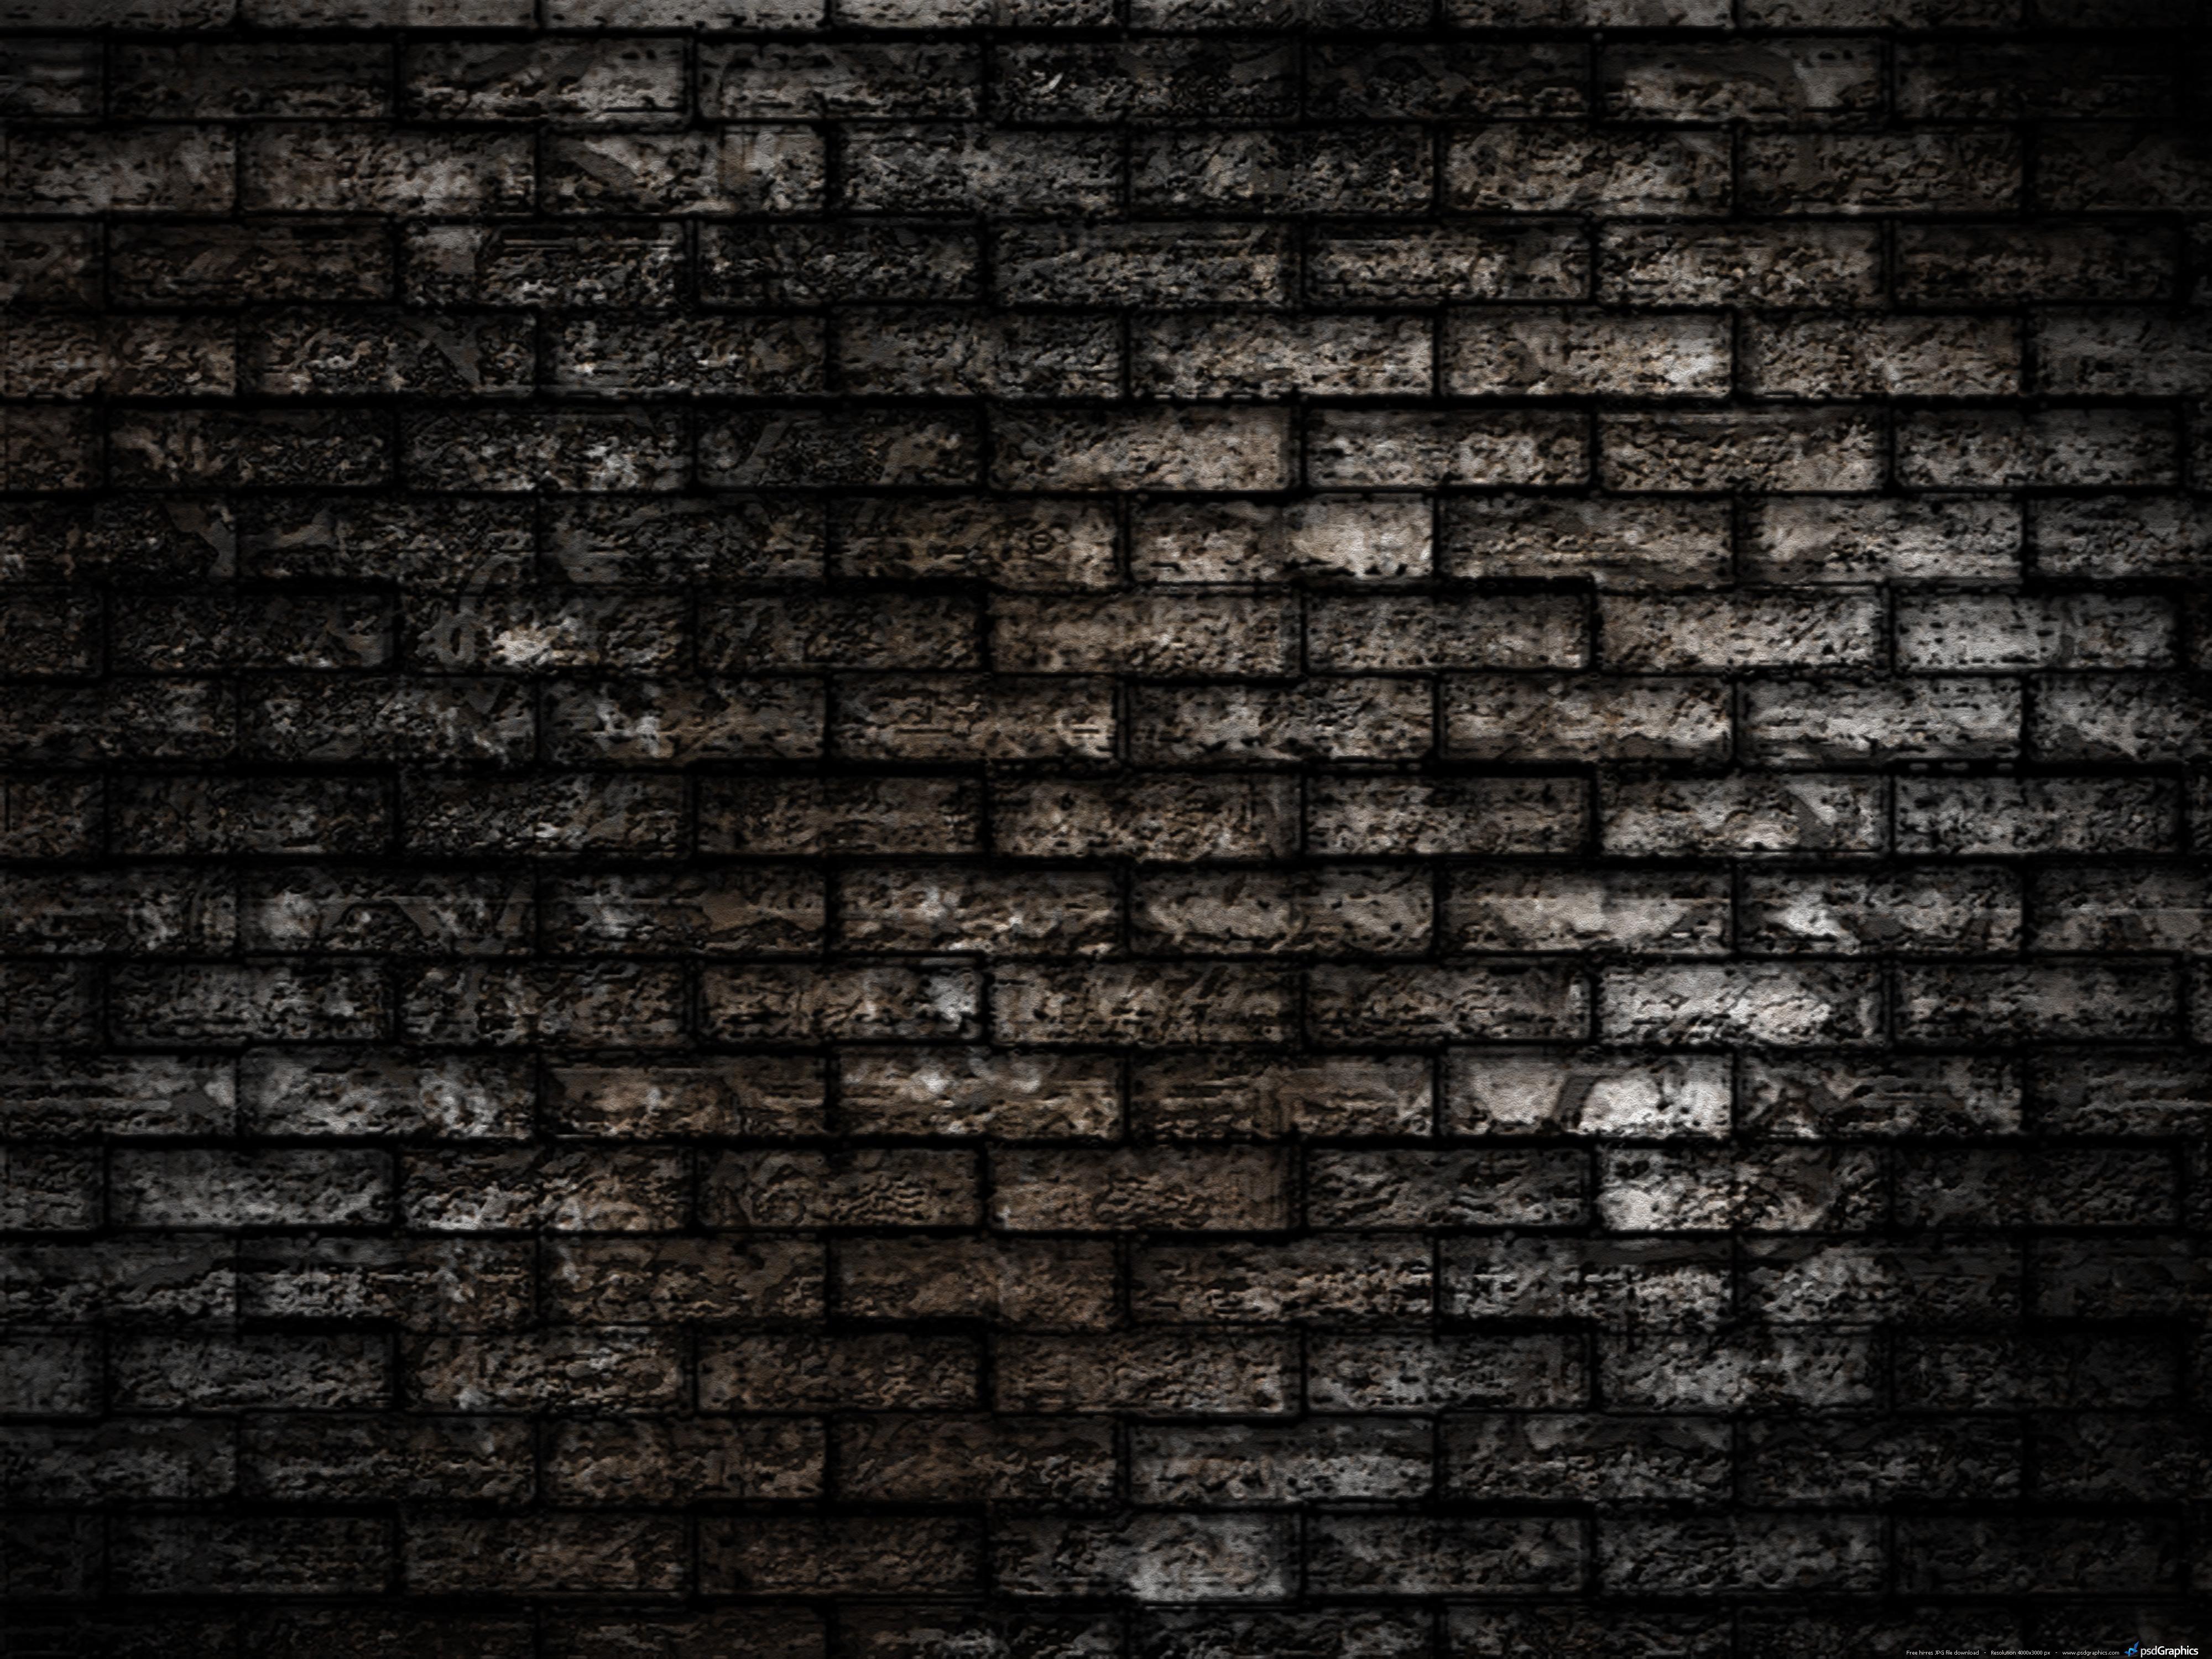 Brick Wall Seamless Brickwall Dark Texture - DMA Homes | #57976